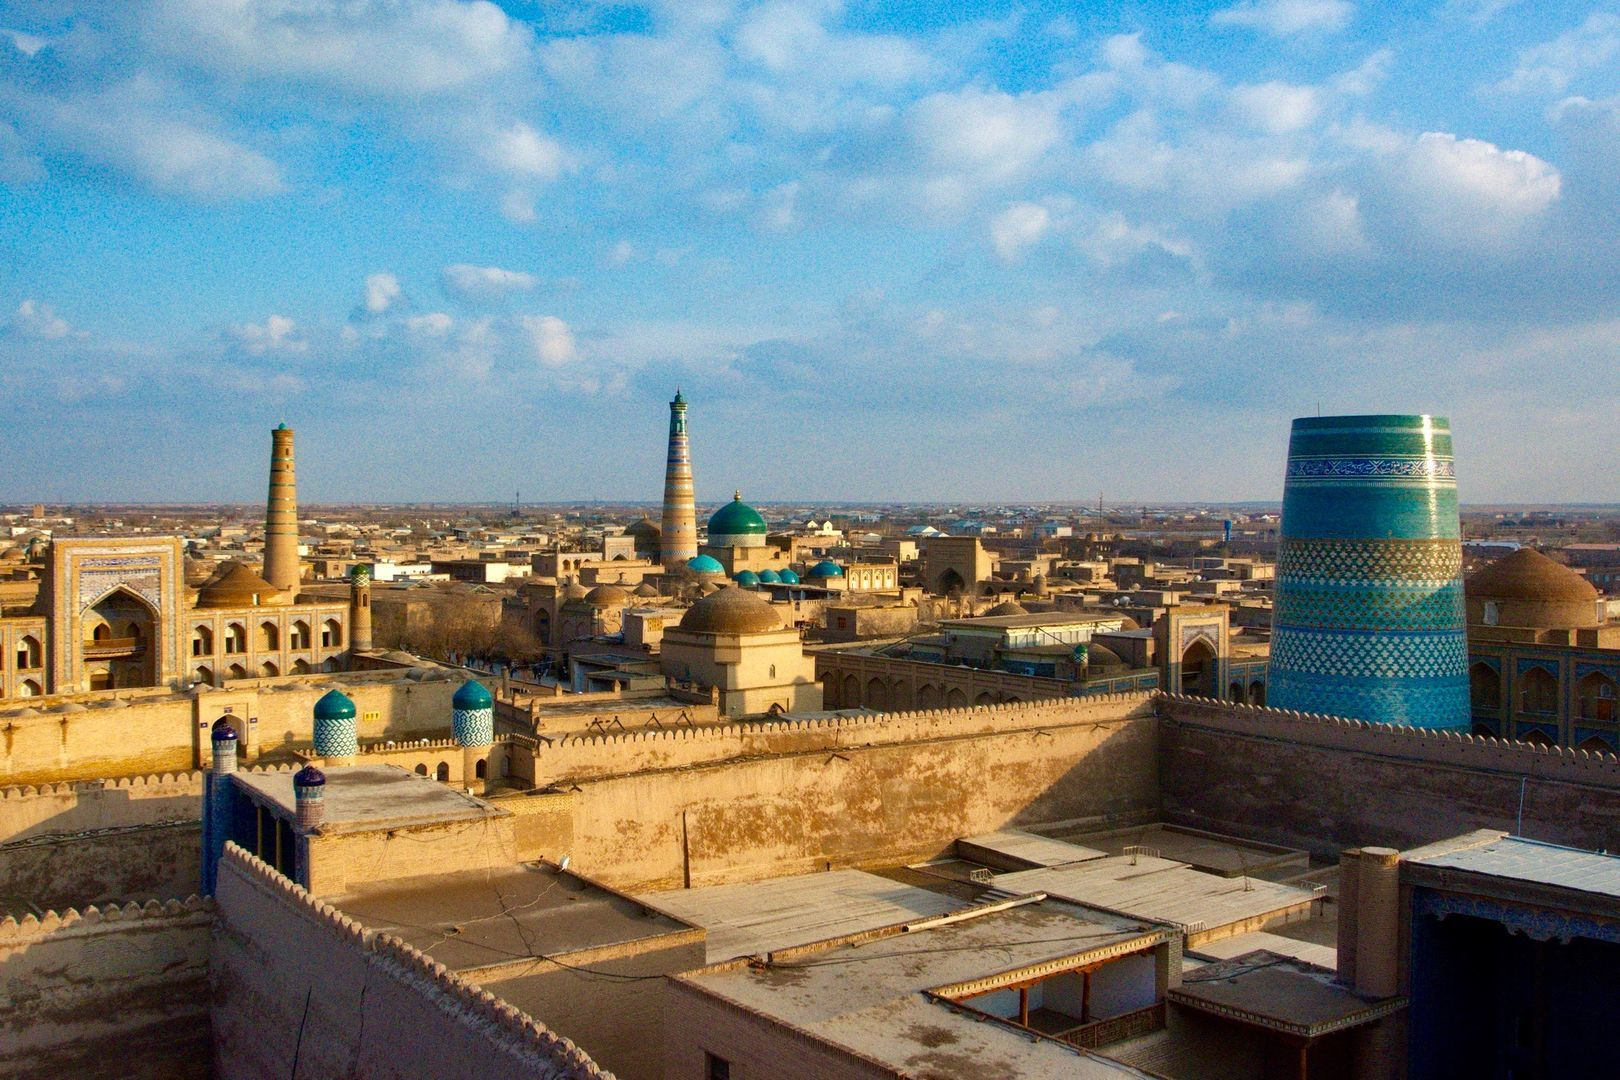 Best Central Asia tour: view of the ancient Khiva, Uzbekistan